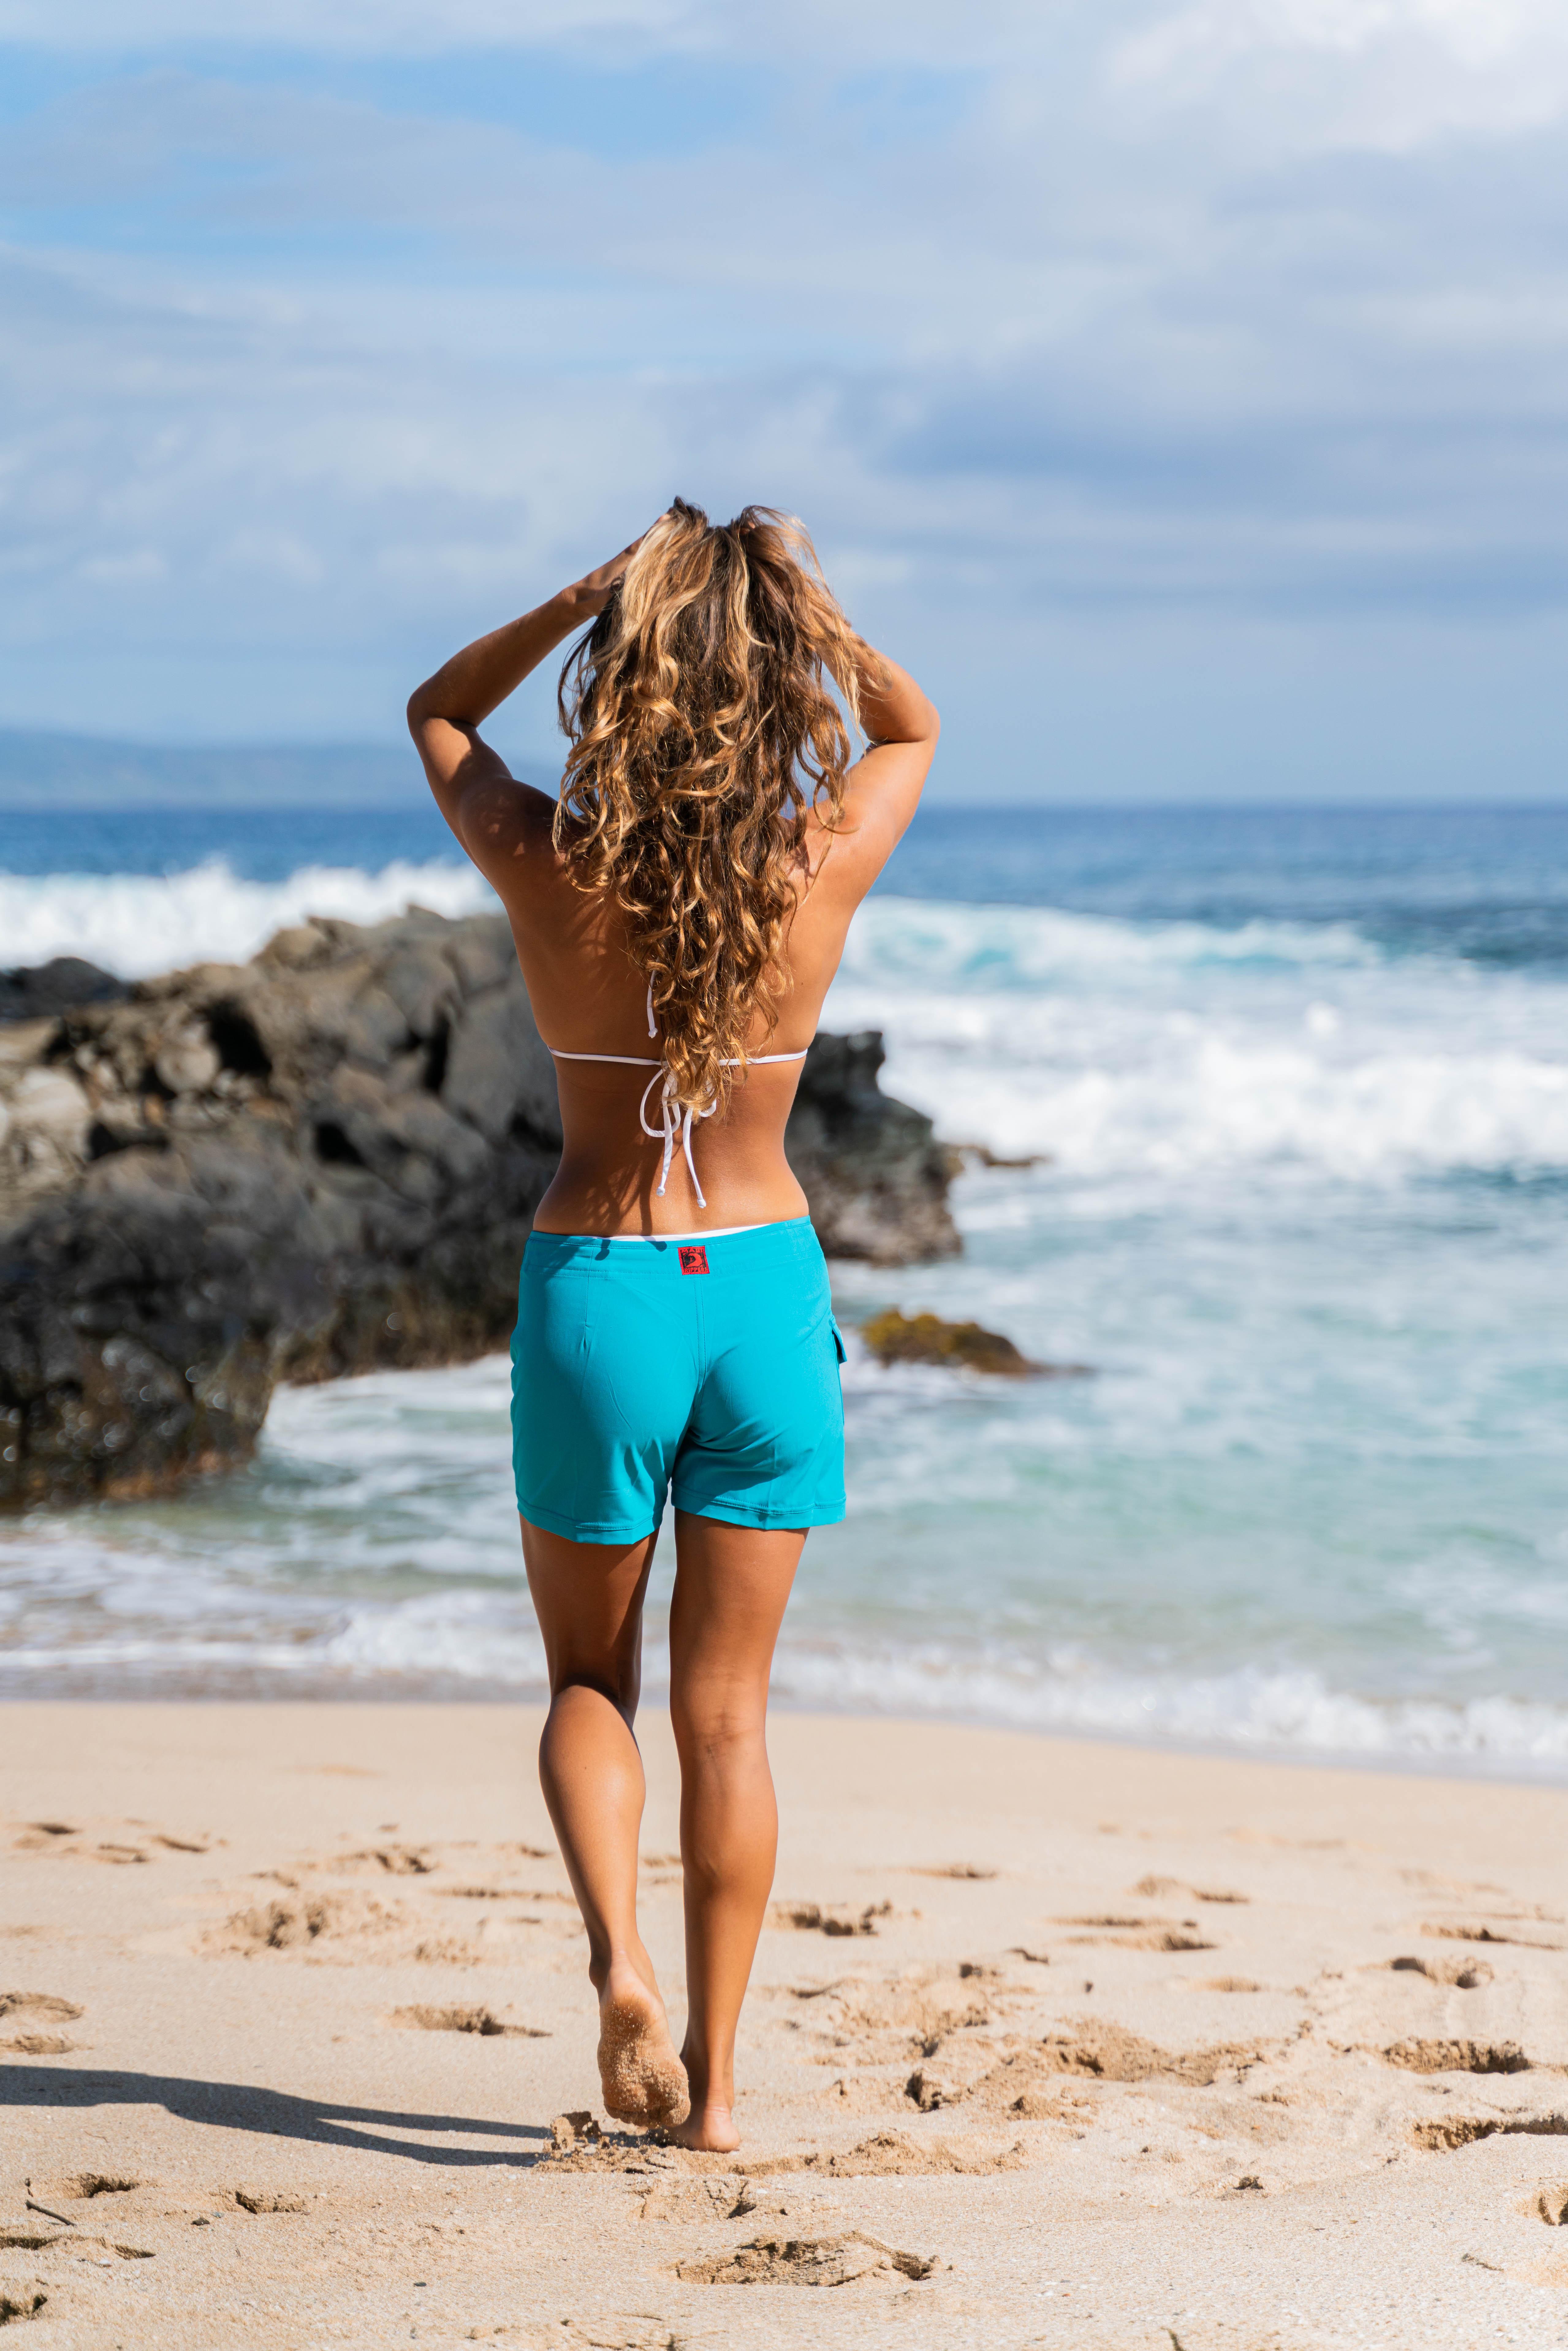 Maui Rippers maui mermaids women's boardshorts swim shorts coverup for beach pool lake